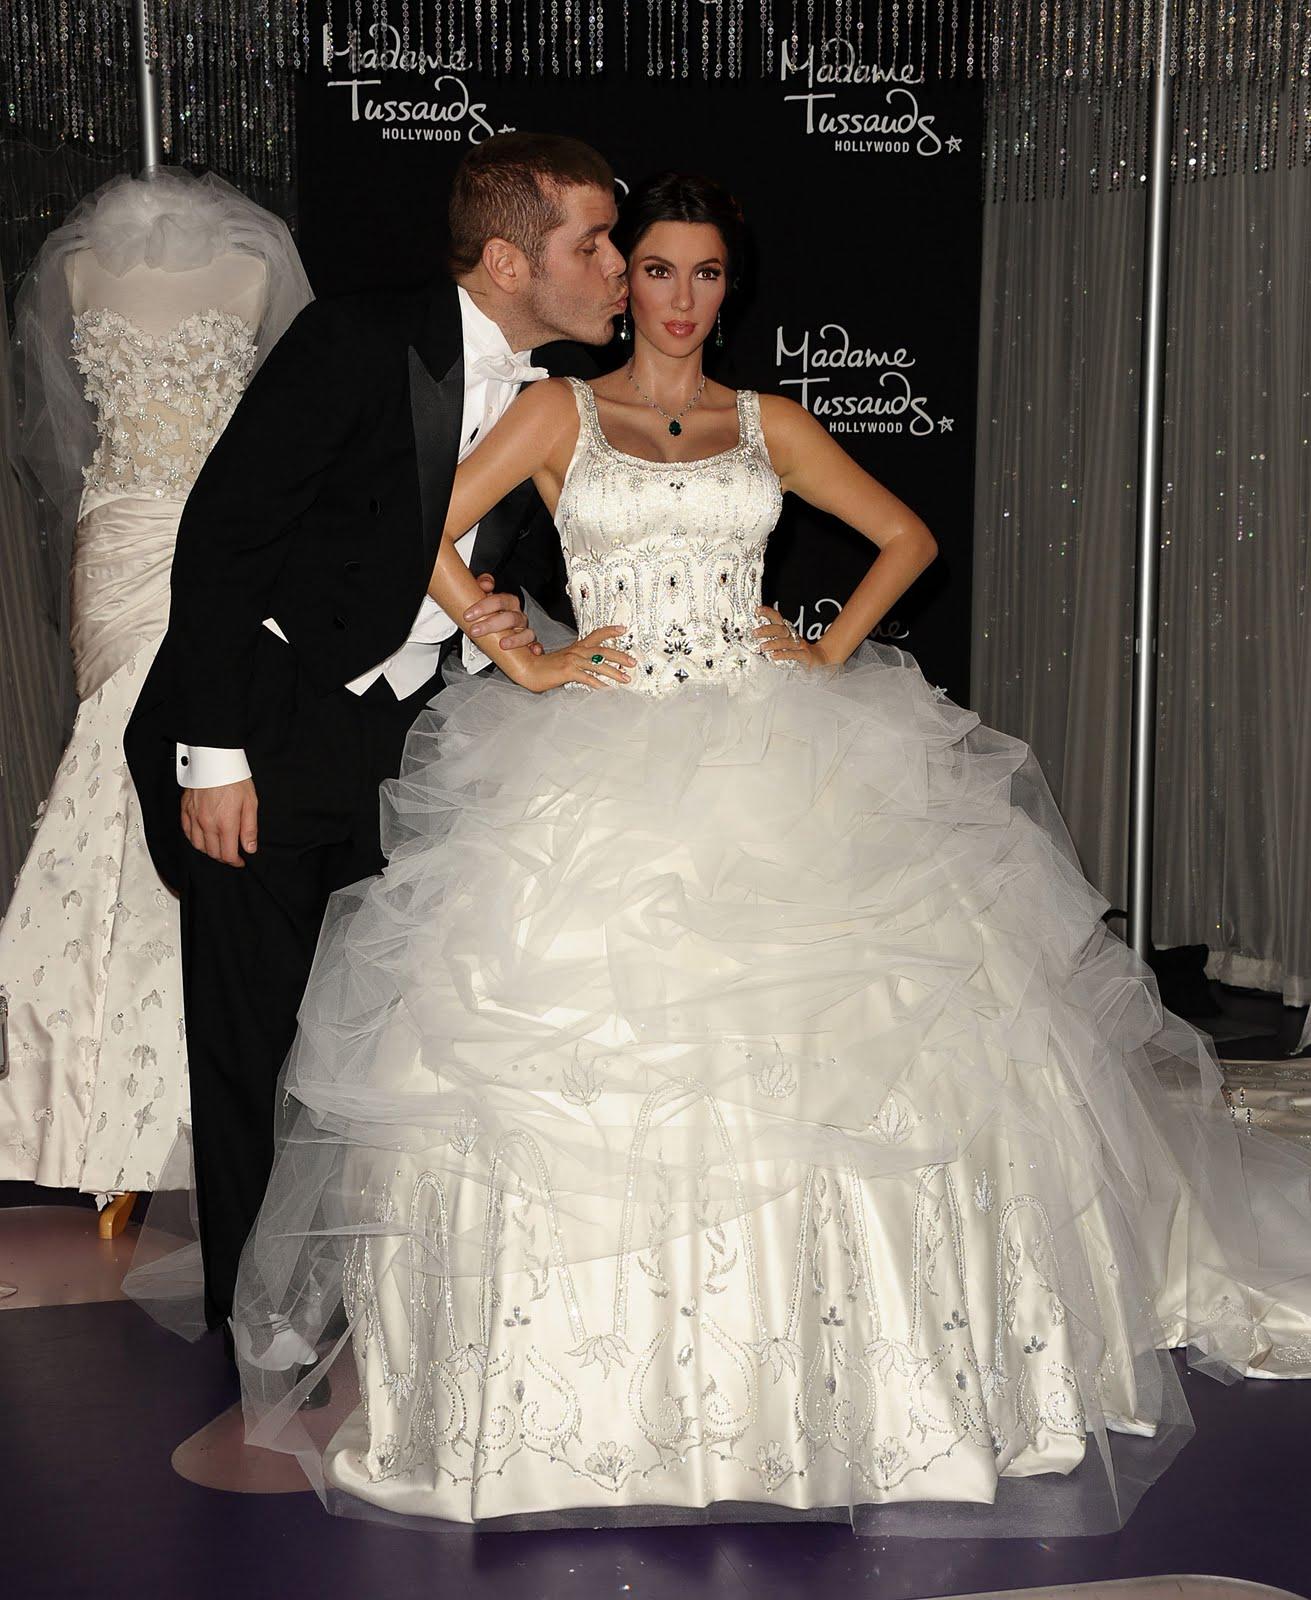 3 Wedding Dresses Kim Kardashian : Funny wallpaper desktop kim kardashian wedding dress hd